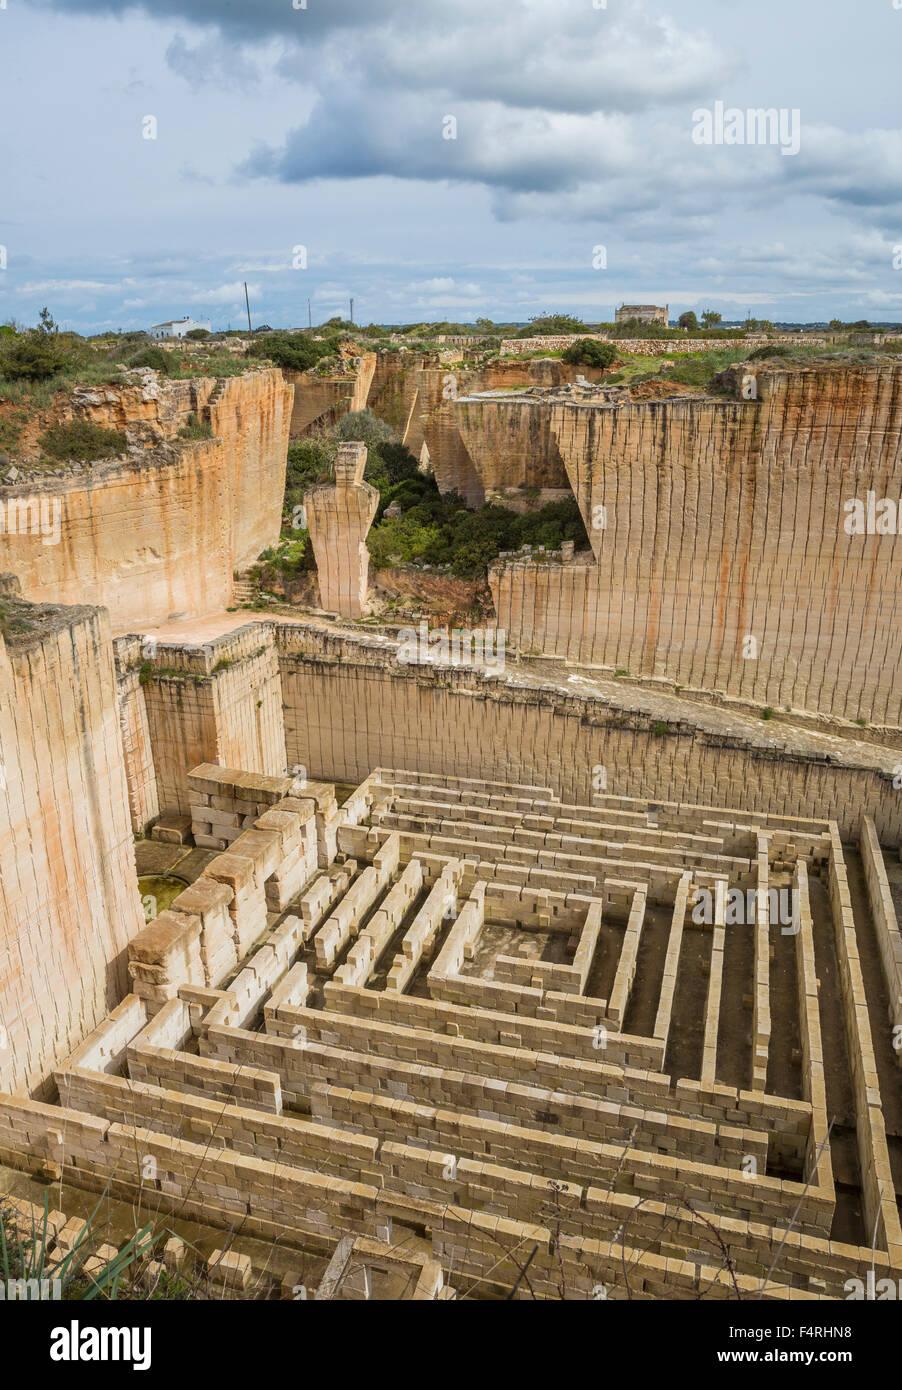 La ville de Ciutadella, Menorca, Lithica,, Island, Espagne, Europe, s'Hostal, architecture, Iles Baléares, Photo Stock